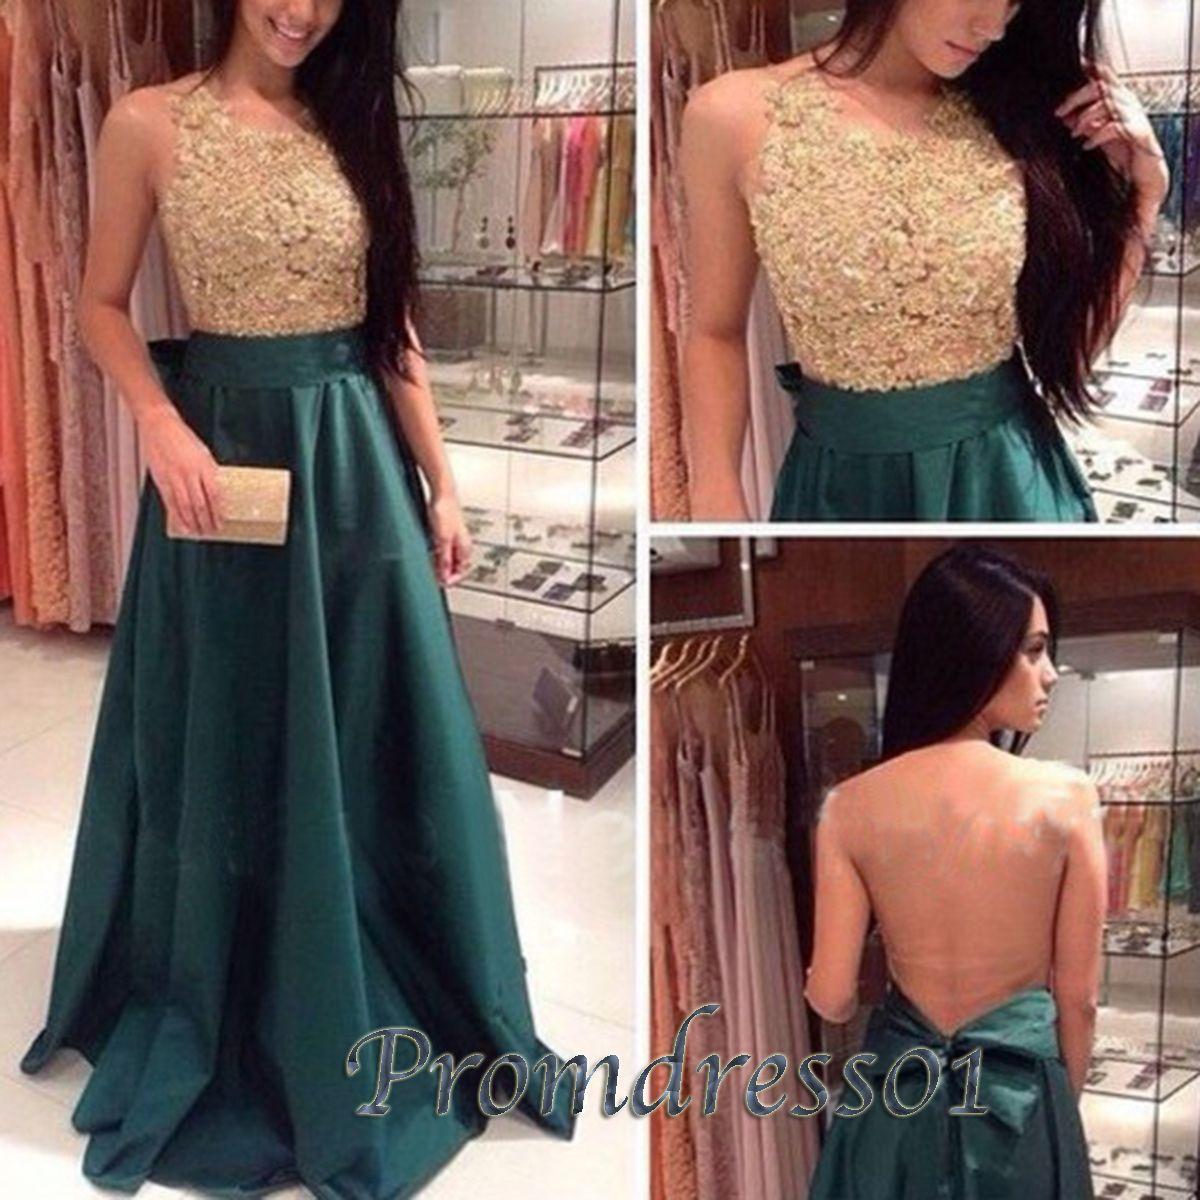 Prom Dress 20  Custom Made Dress  Prom Dress 20  Elegante